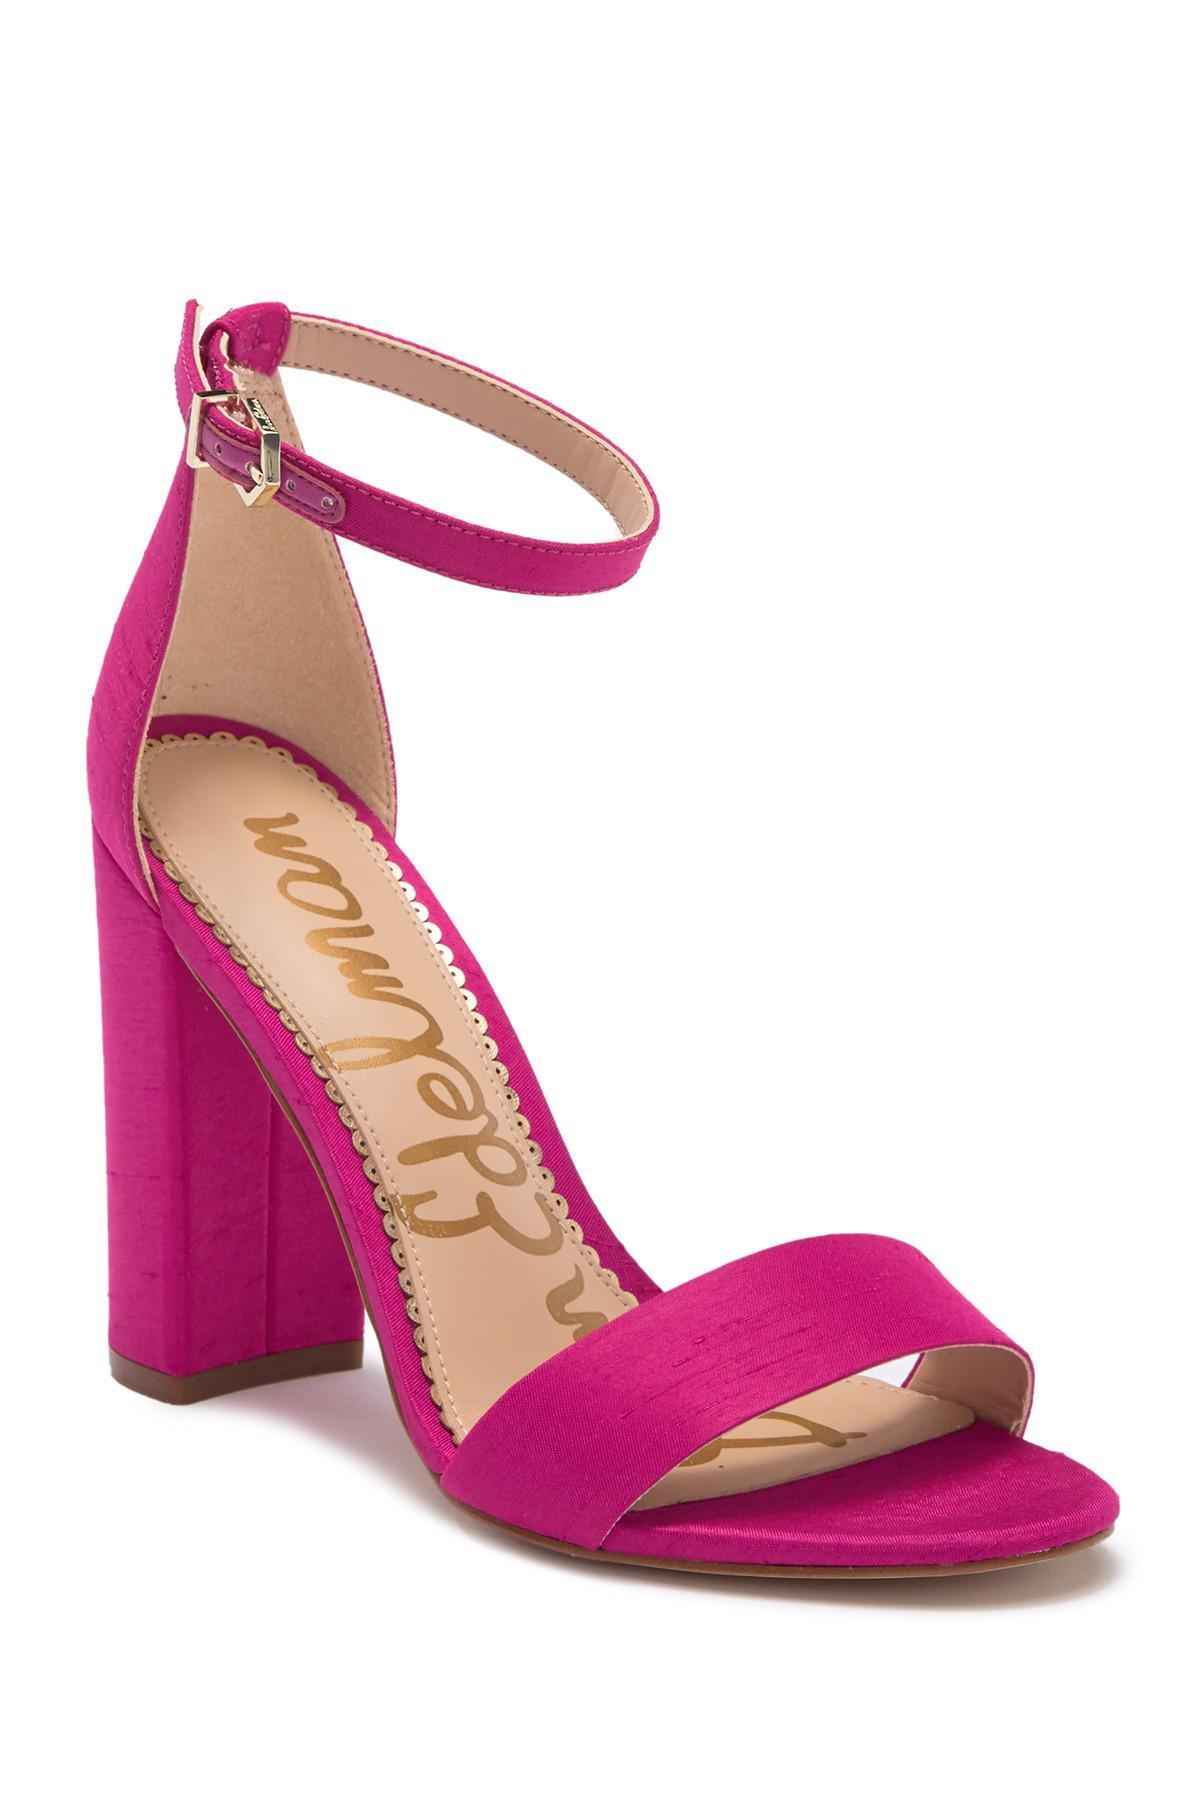 2af6b373da78 Lyst - Sam Edelman Yaro Block Heel Sandal in Pink - Save 43%